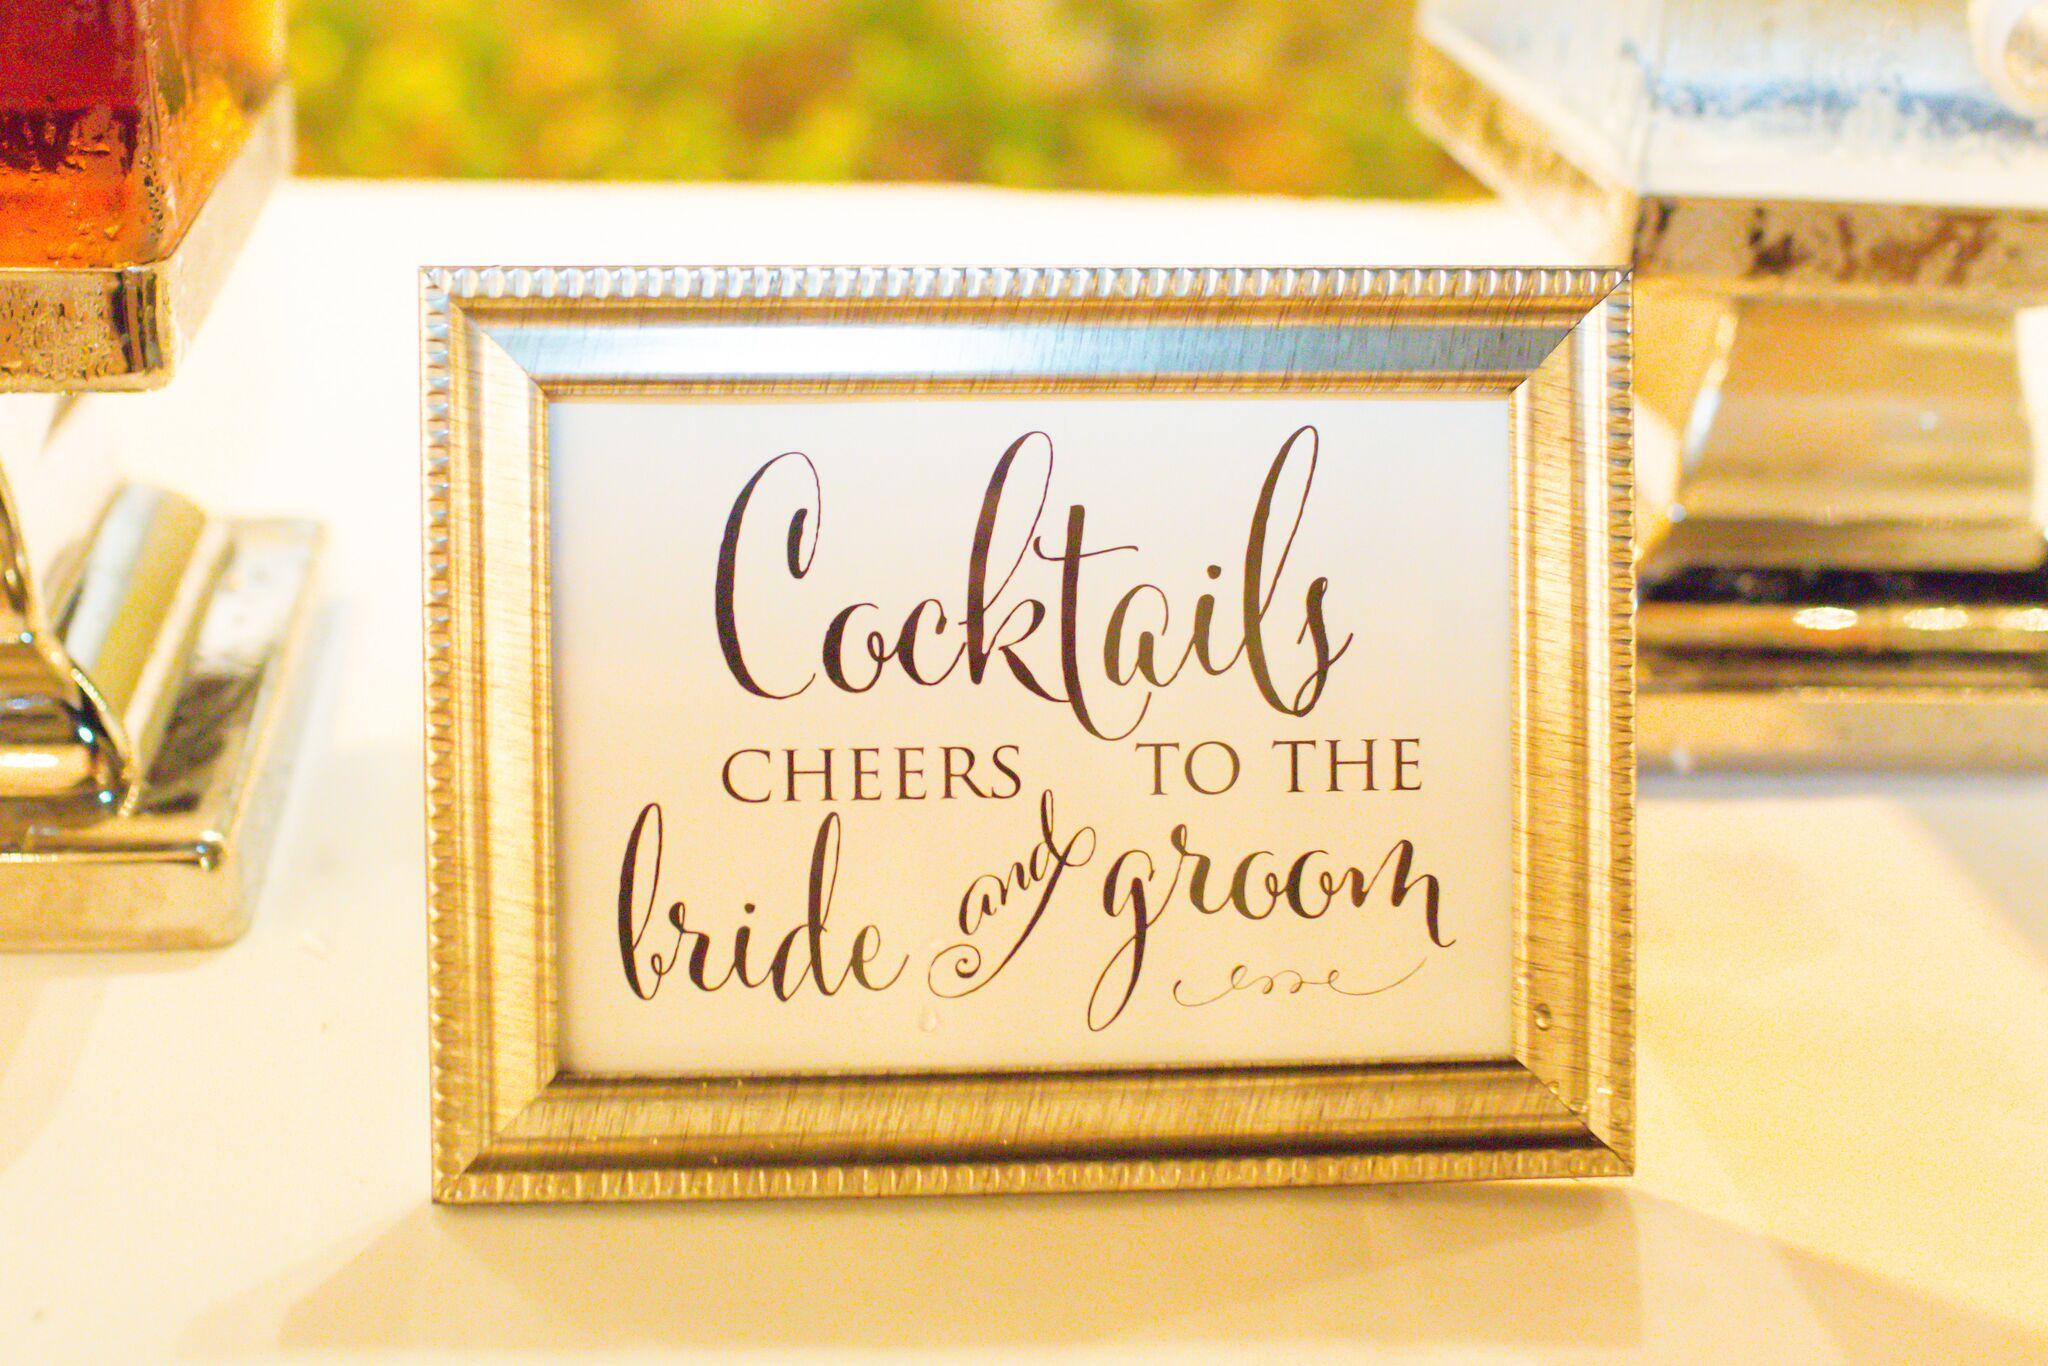 www.santabarbarawedding.com | James and Jess Fairchild Photography | Brenda Cali Santa Barbara Club Wedding | Signature Drink Sign | Frame Bar Drink